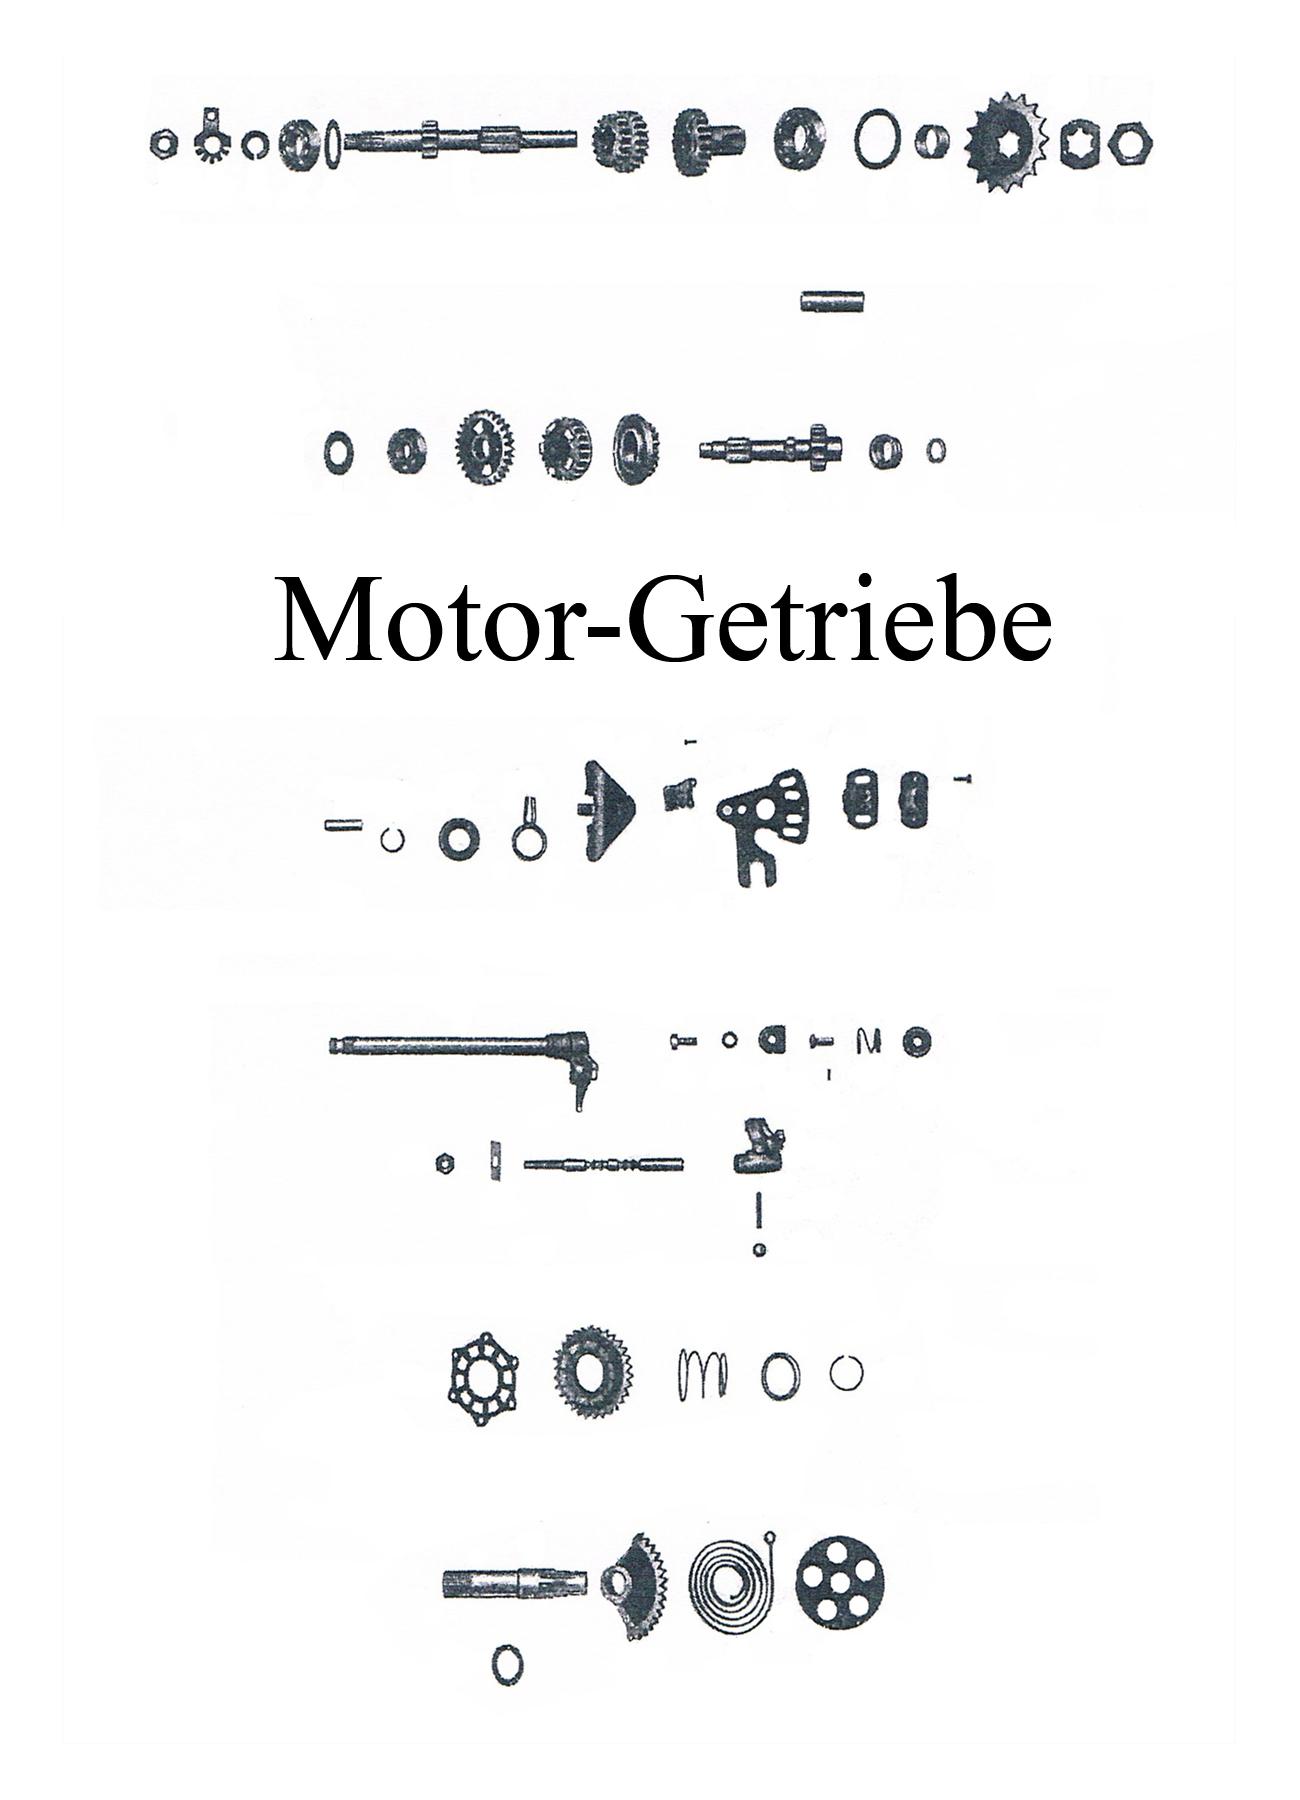 DDR-Motorrad IWL Berliner Roller SR 59 Ersatzteileliste Motor Getriebe Zahnrad Ritzel Welle Mutter Sicherungsblech